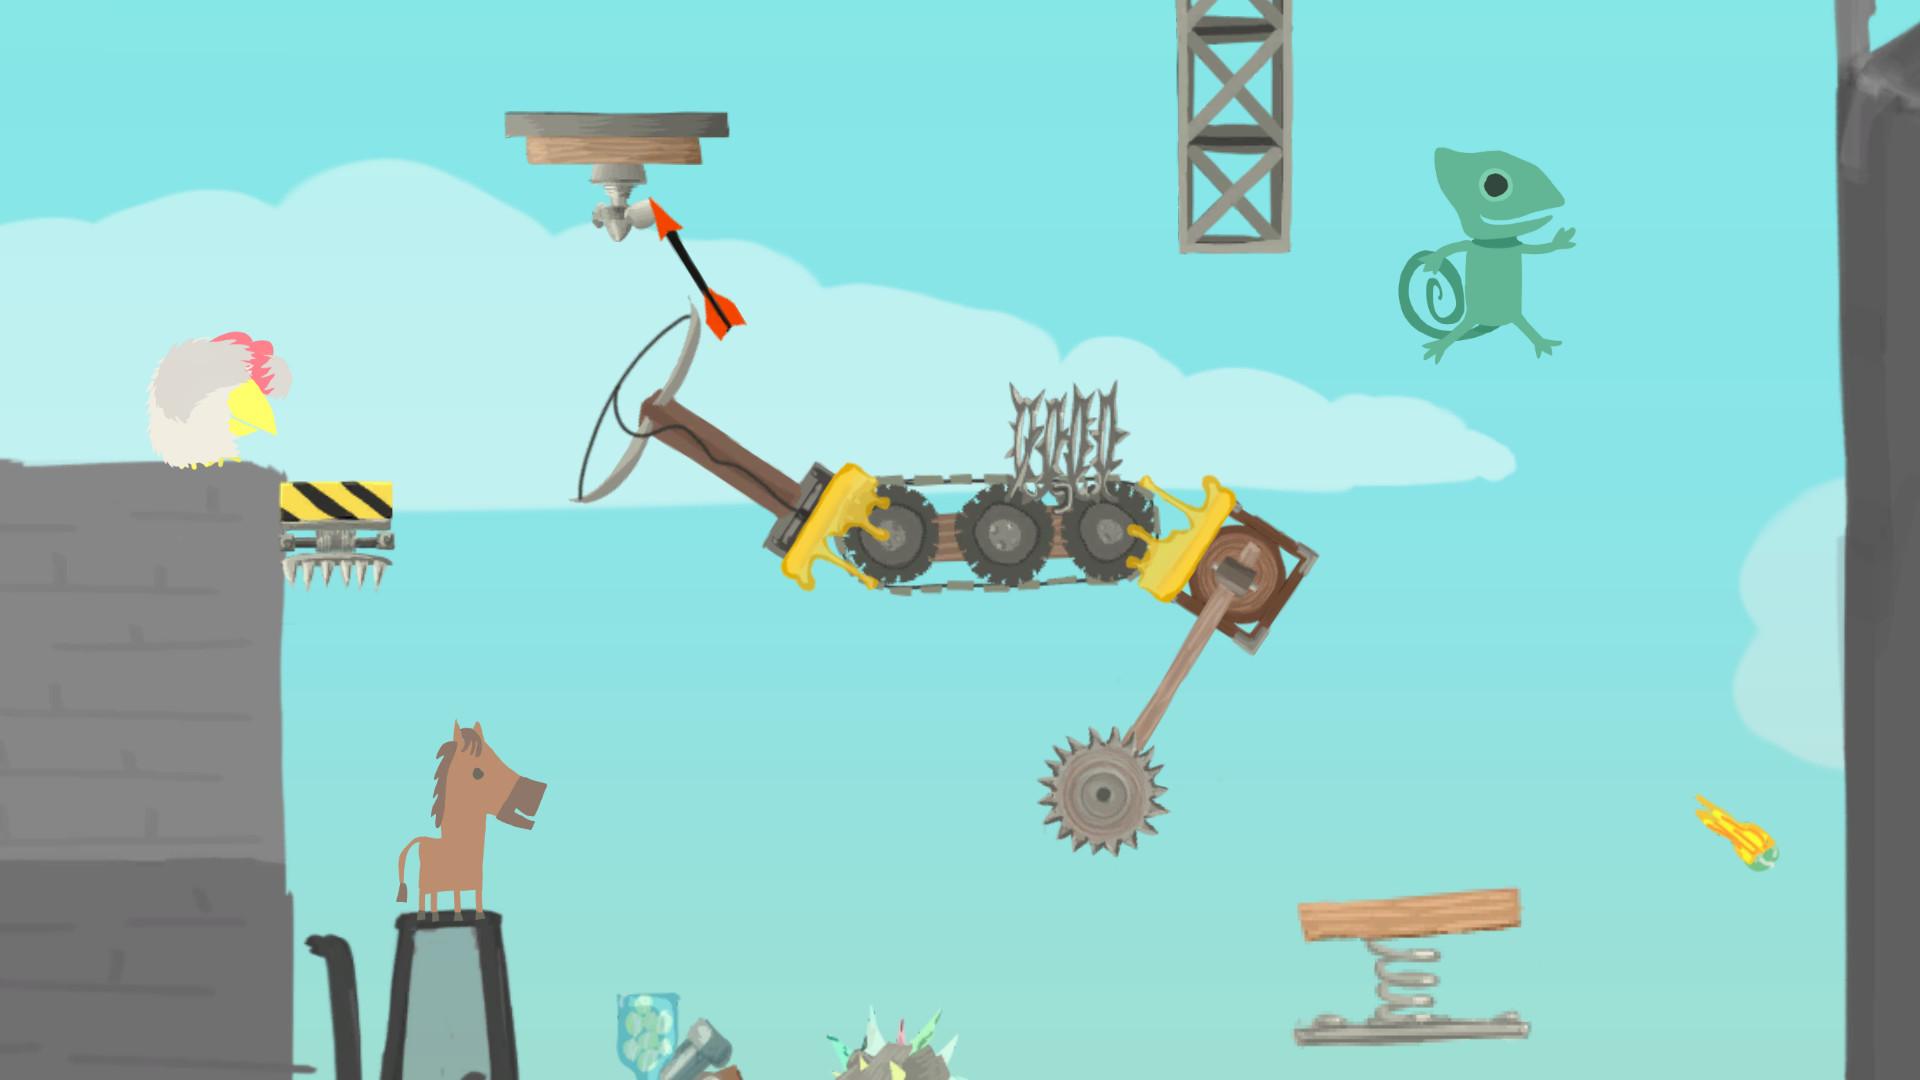 Скачать ultimate chicken horse 1. 0. 55 для android.